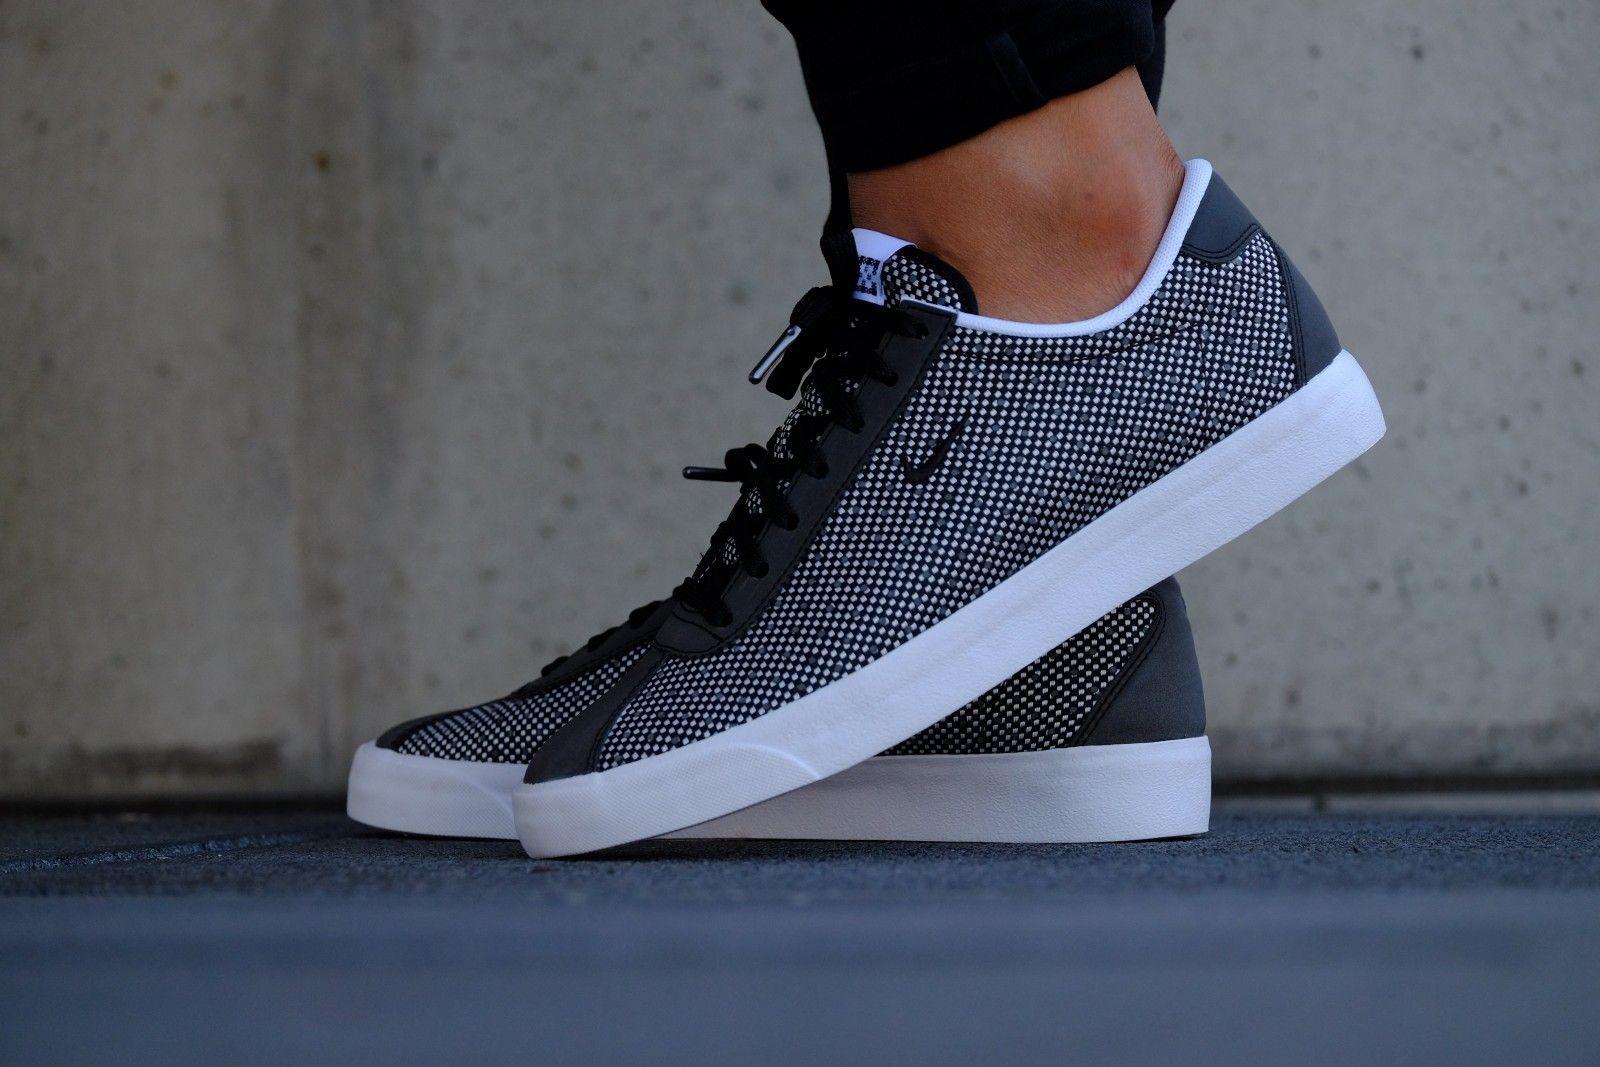 Nike Match Classic KJCRD White/ Black-Reflective Silver - 867125-100 · Nike  ShoxNike SneakersNike Casual ShoesJordan ...